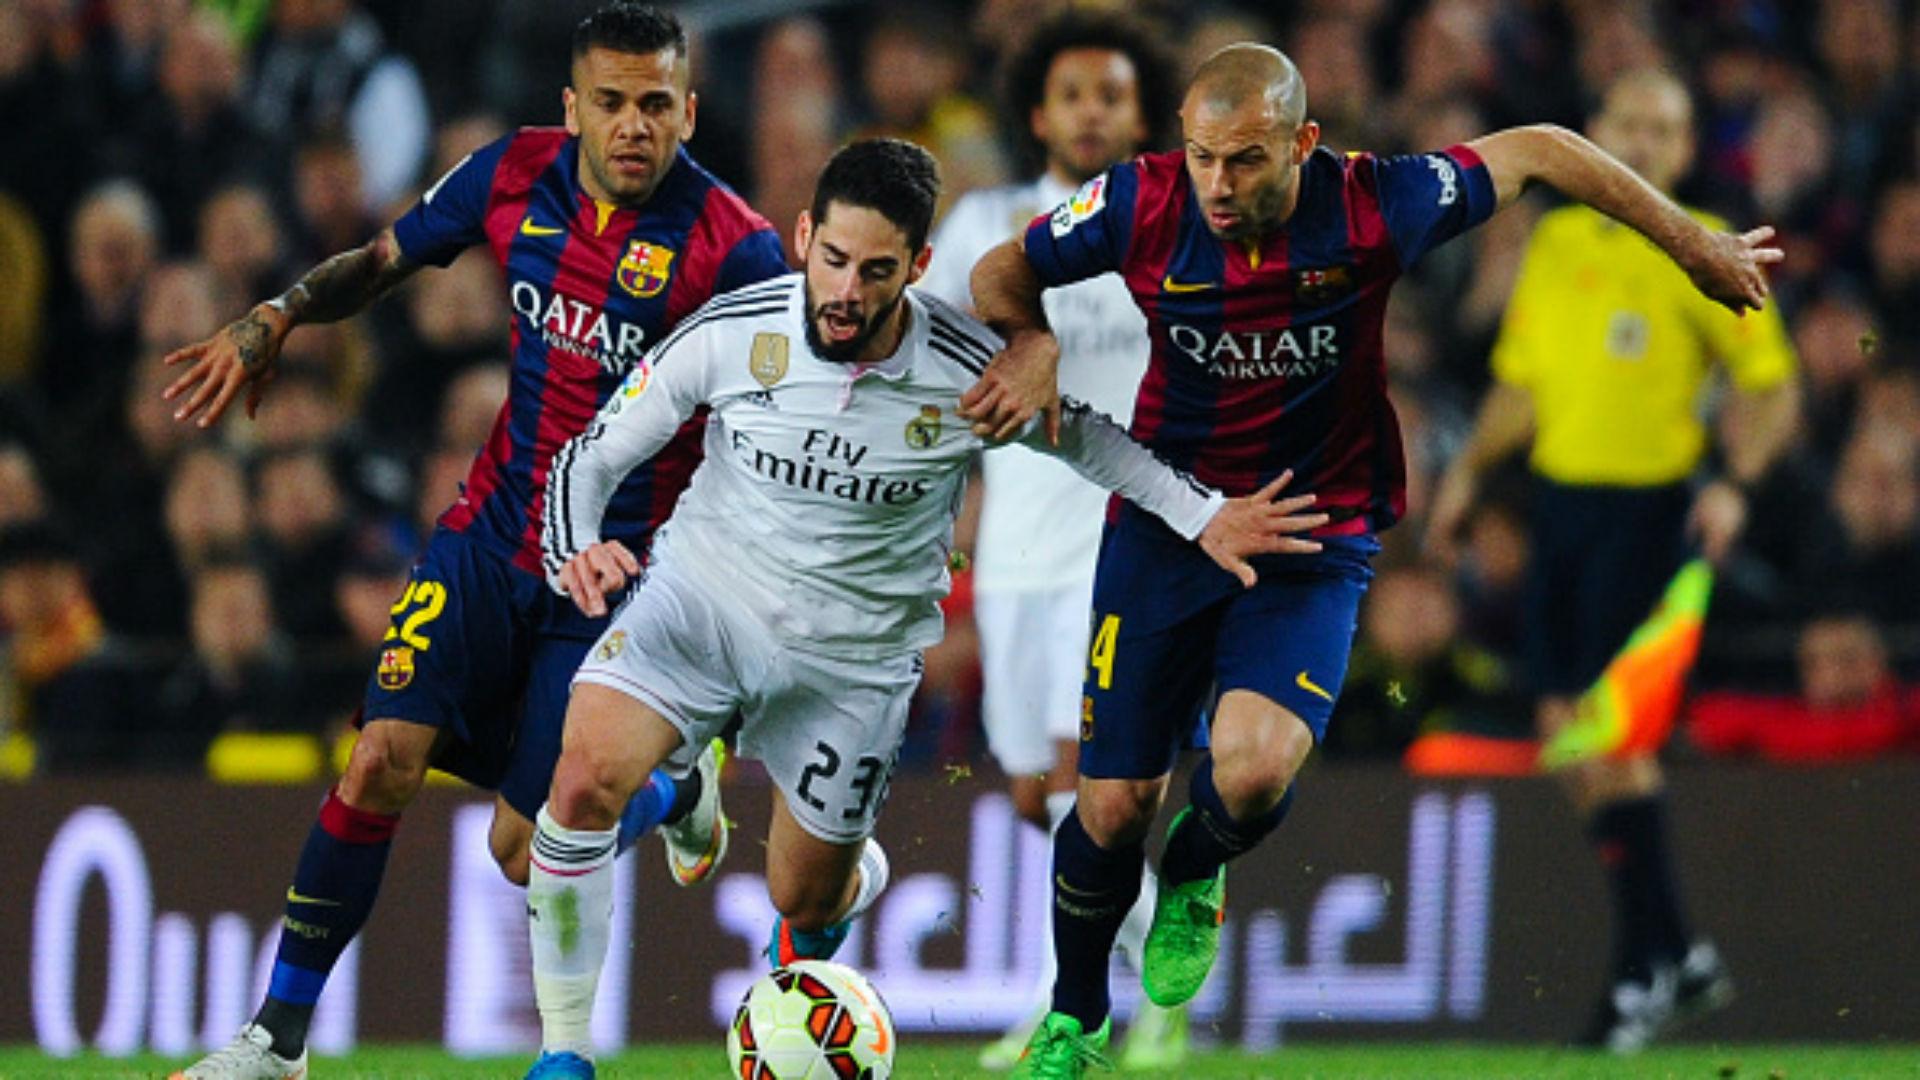 Barcelona Real Madrid 15/16 La Liga Camp Nou Isco Mascherano